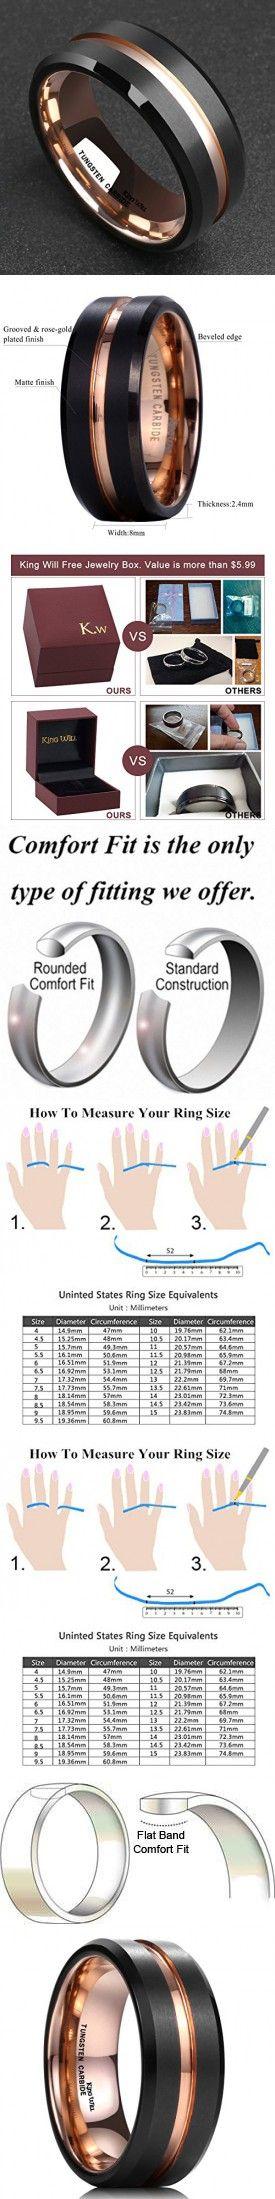 King Will Mens 8mm Black Matte Finish Tungsten Carbide Ring 18K Rose Gold Plated Beveled Edge Wedding Band(8.5)